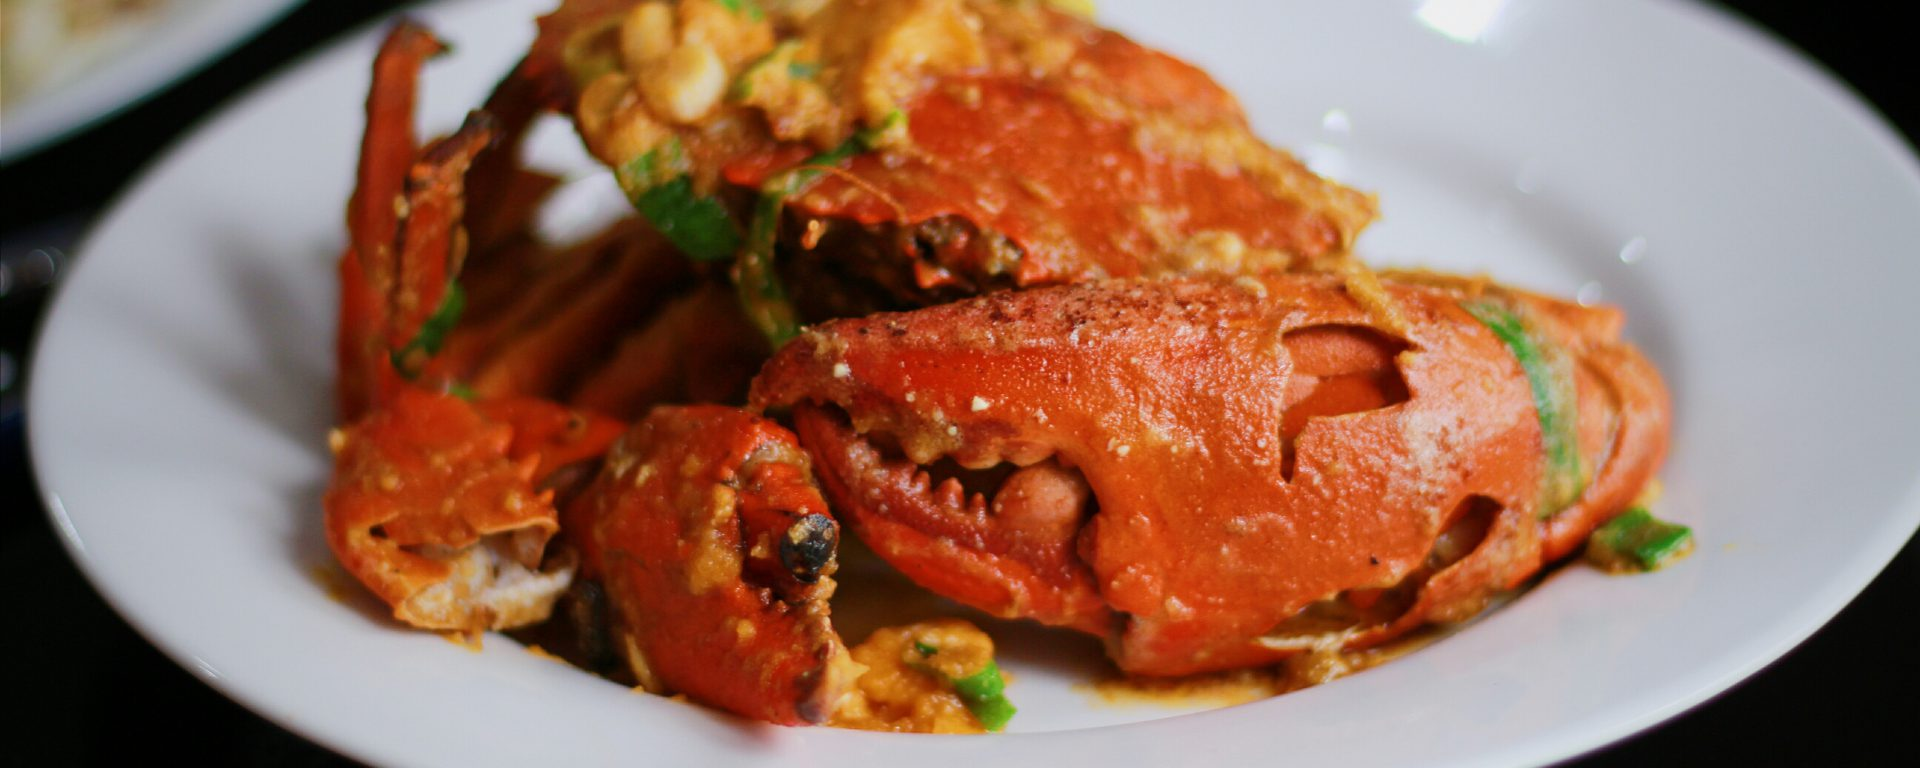 jajanbeken grand kuring seafood jakarta barat